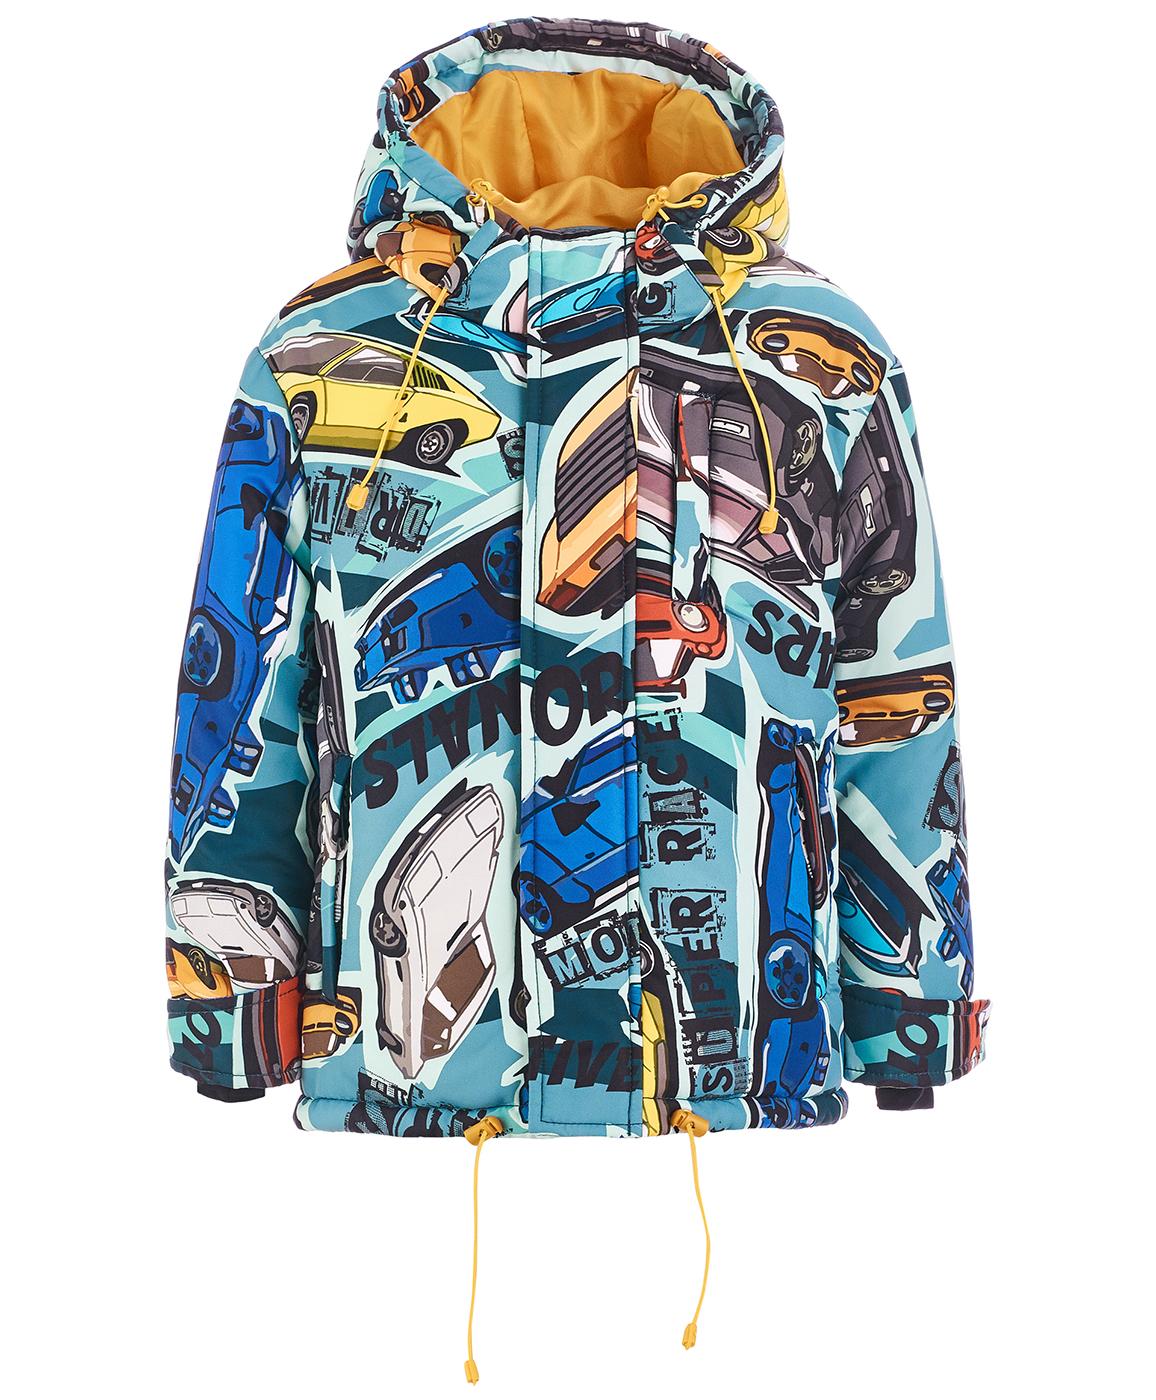 Купить 218BBBA41020121, Куртка Button Blue, BUTTON BLUE Active, голубой, 128, Мужской, ОСЕНЬ/ЗИМА 2018-2019 (shop: GulliverMarket Gulliver Market)